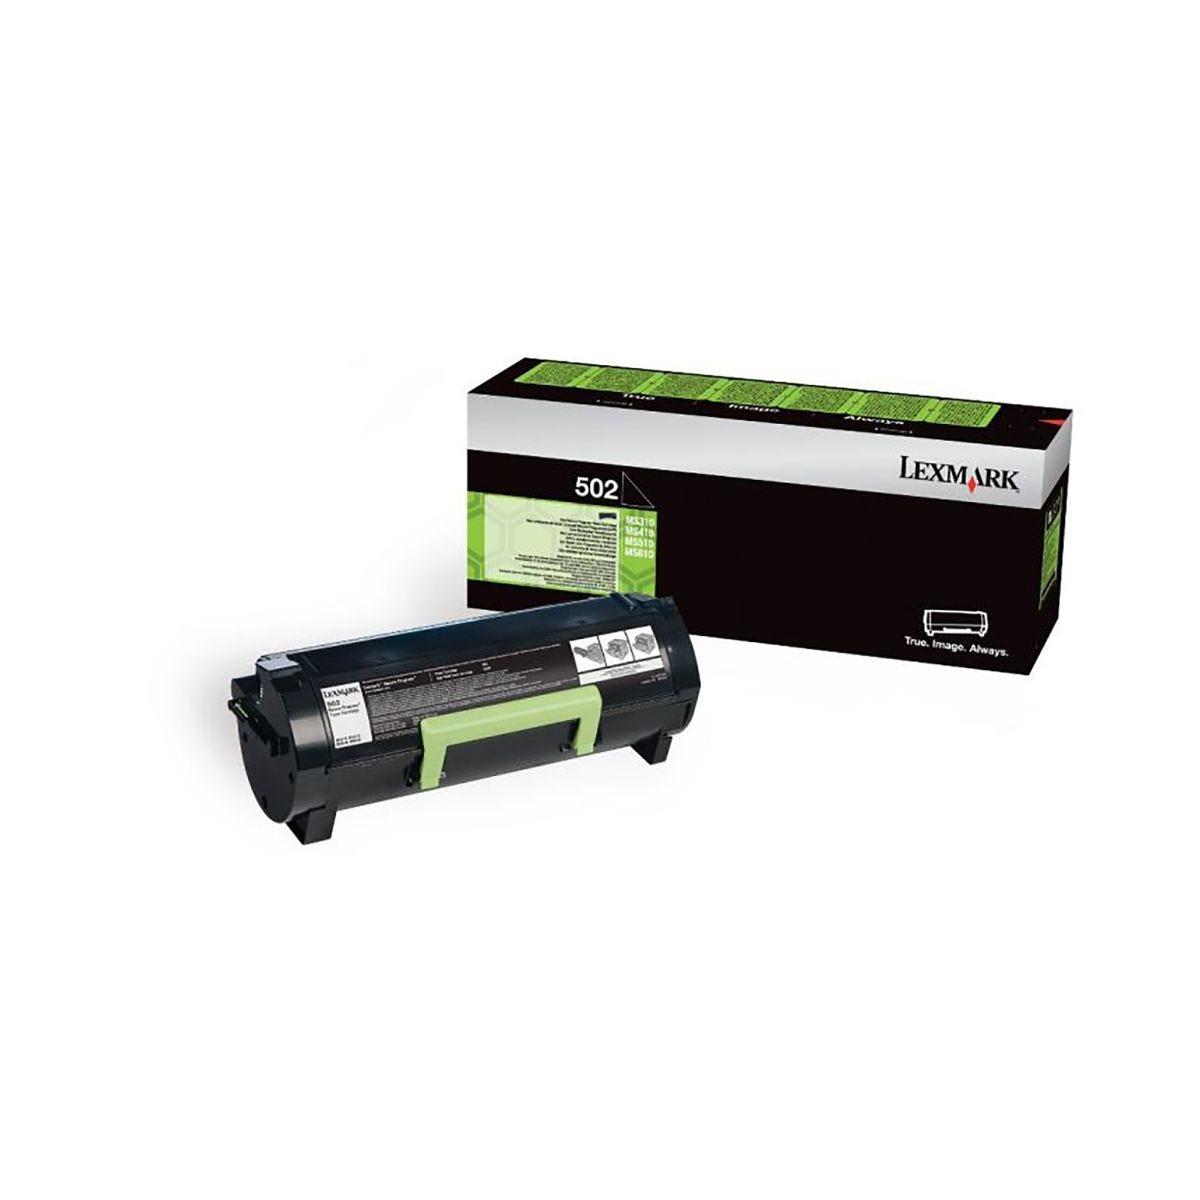 Image of Lexmark 502 Ink Toner Cartridge, Black